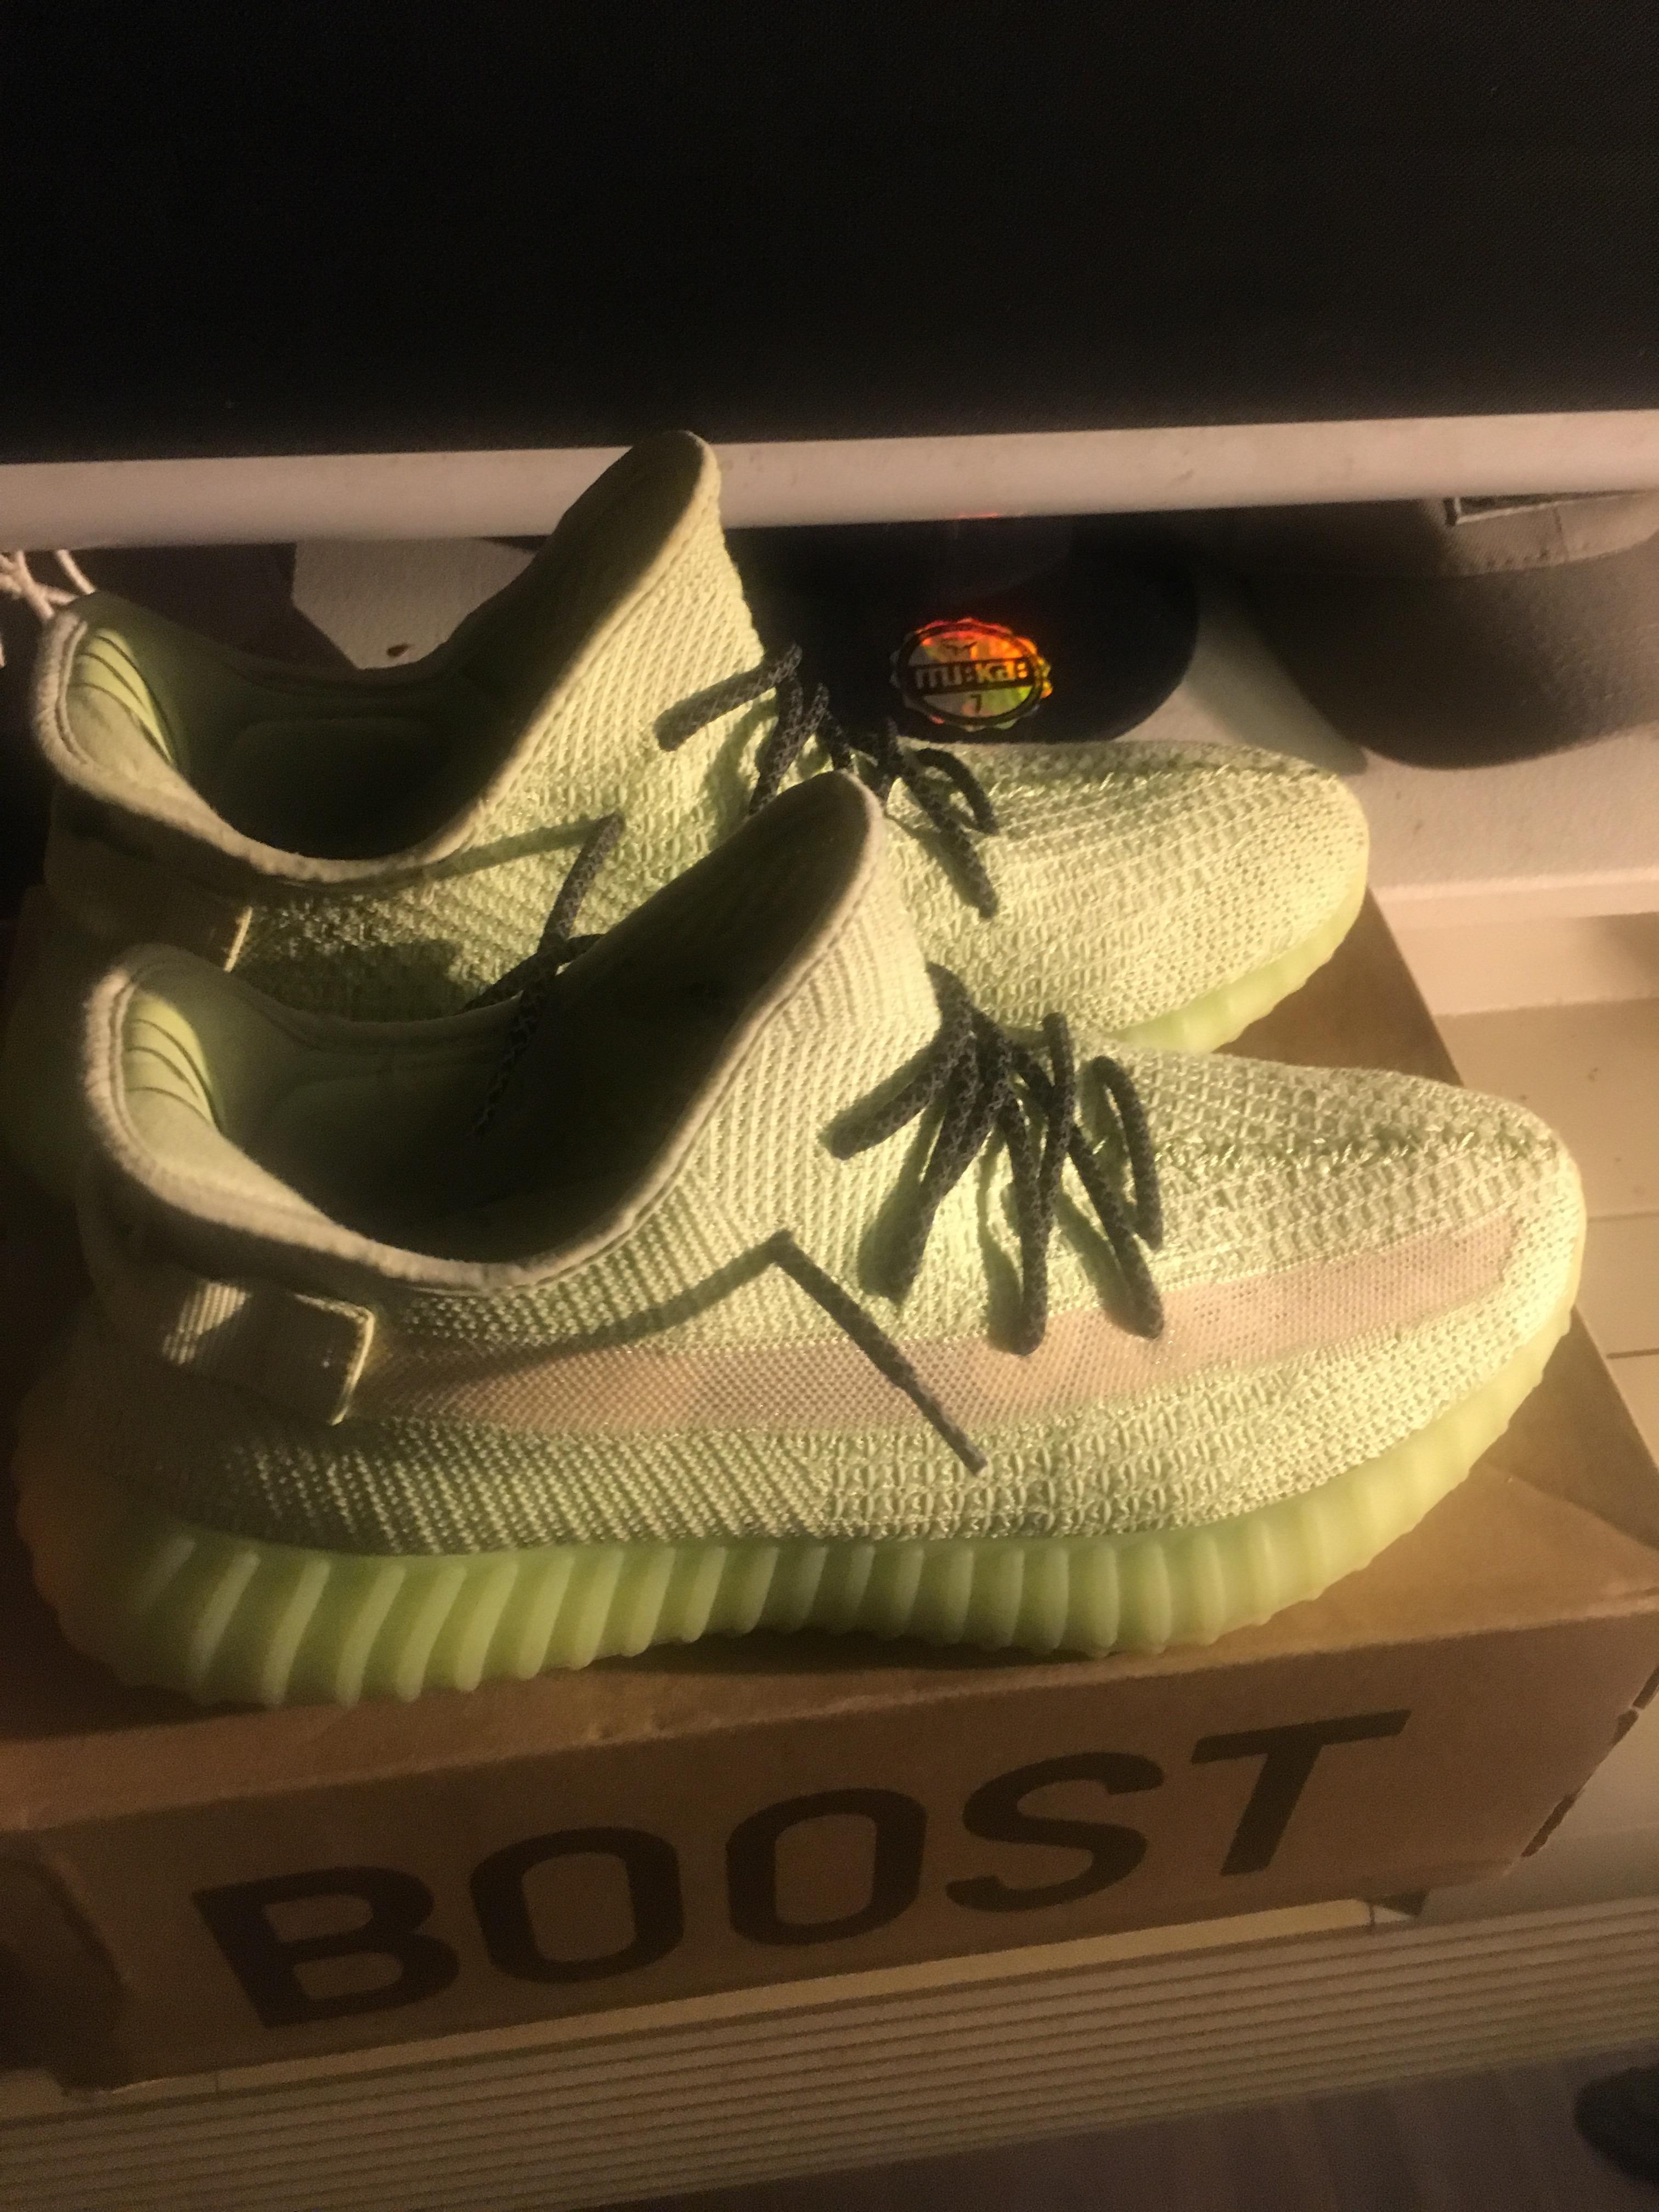 Adidas Yeezy - $250 - Size 12